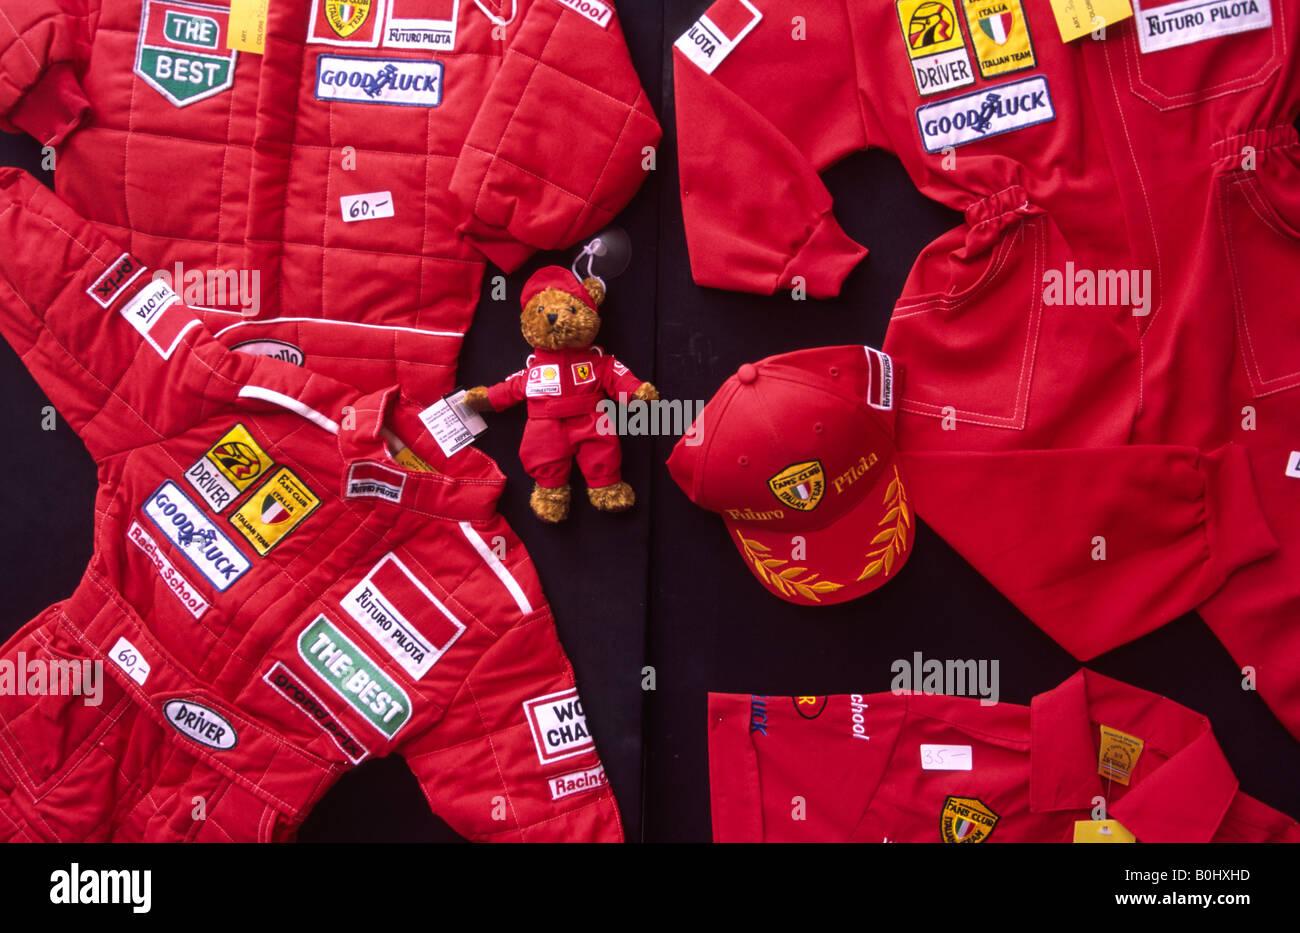 Michael Schumacher latest What we know about F1 legend